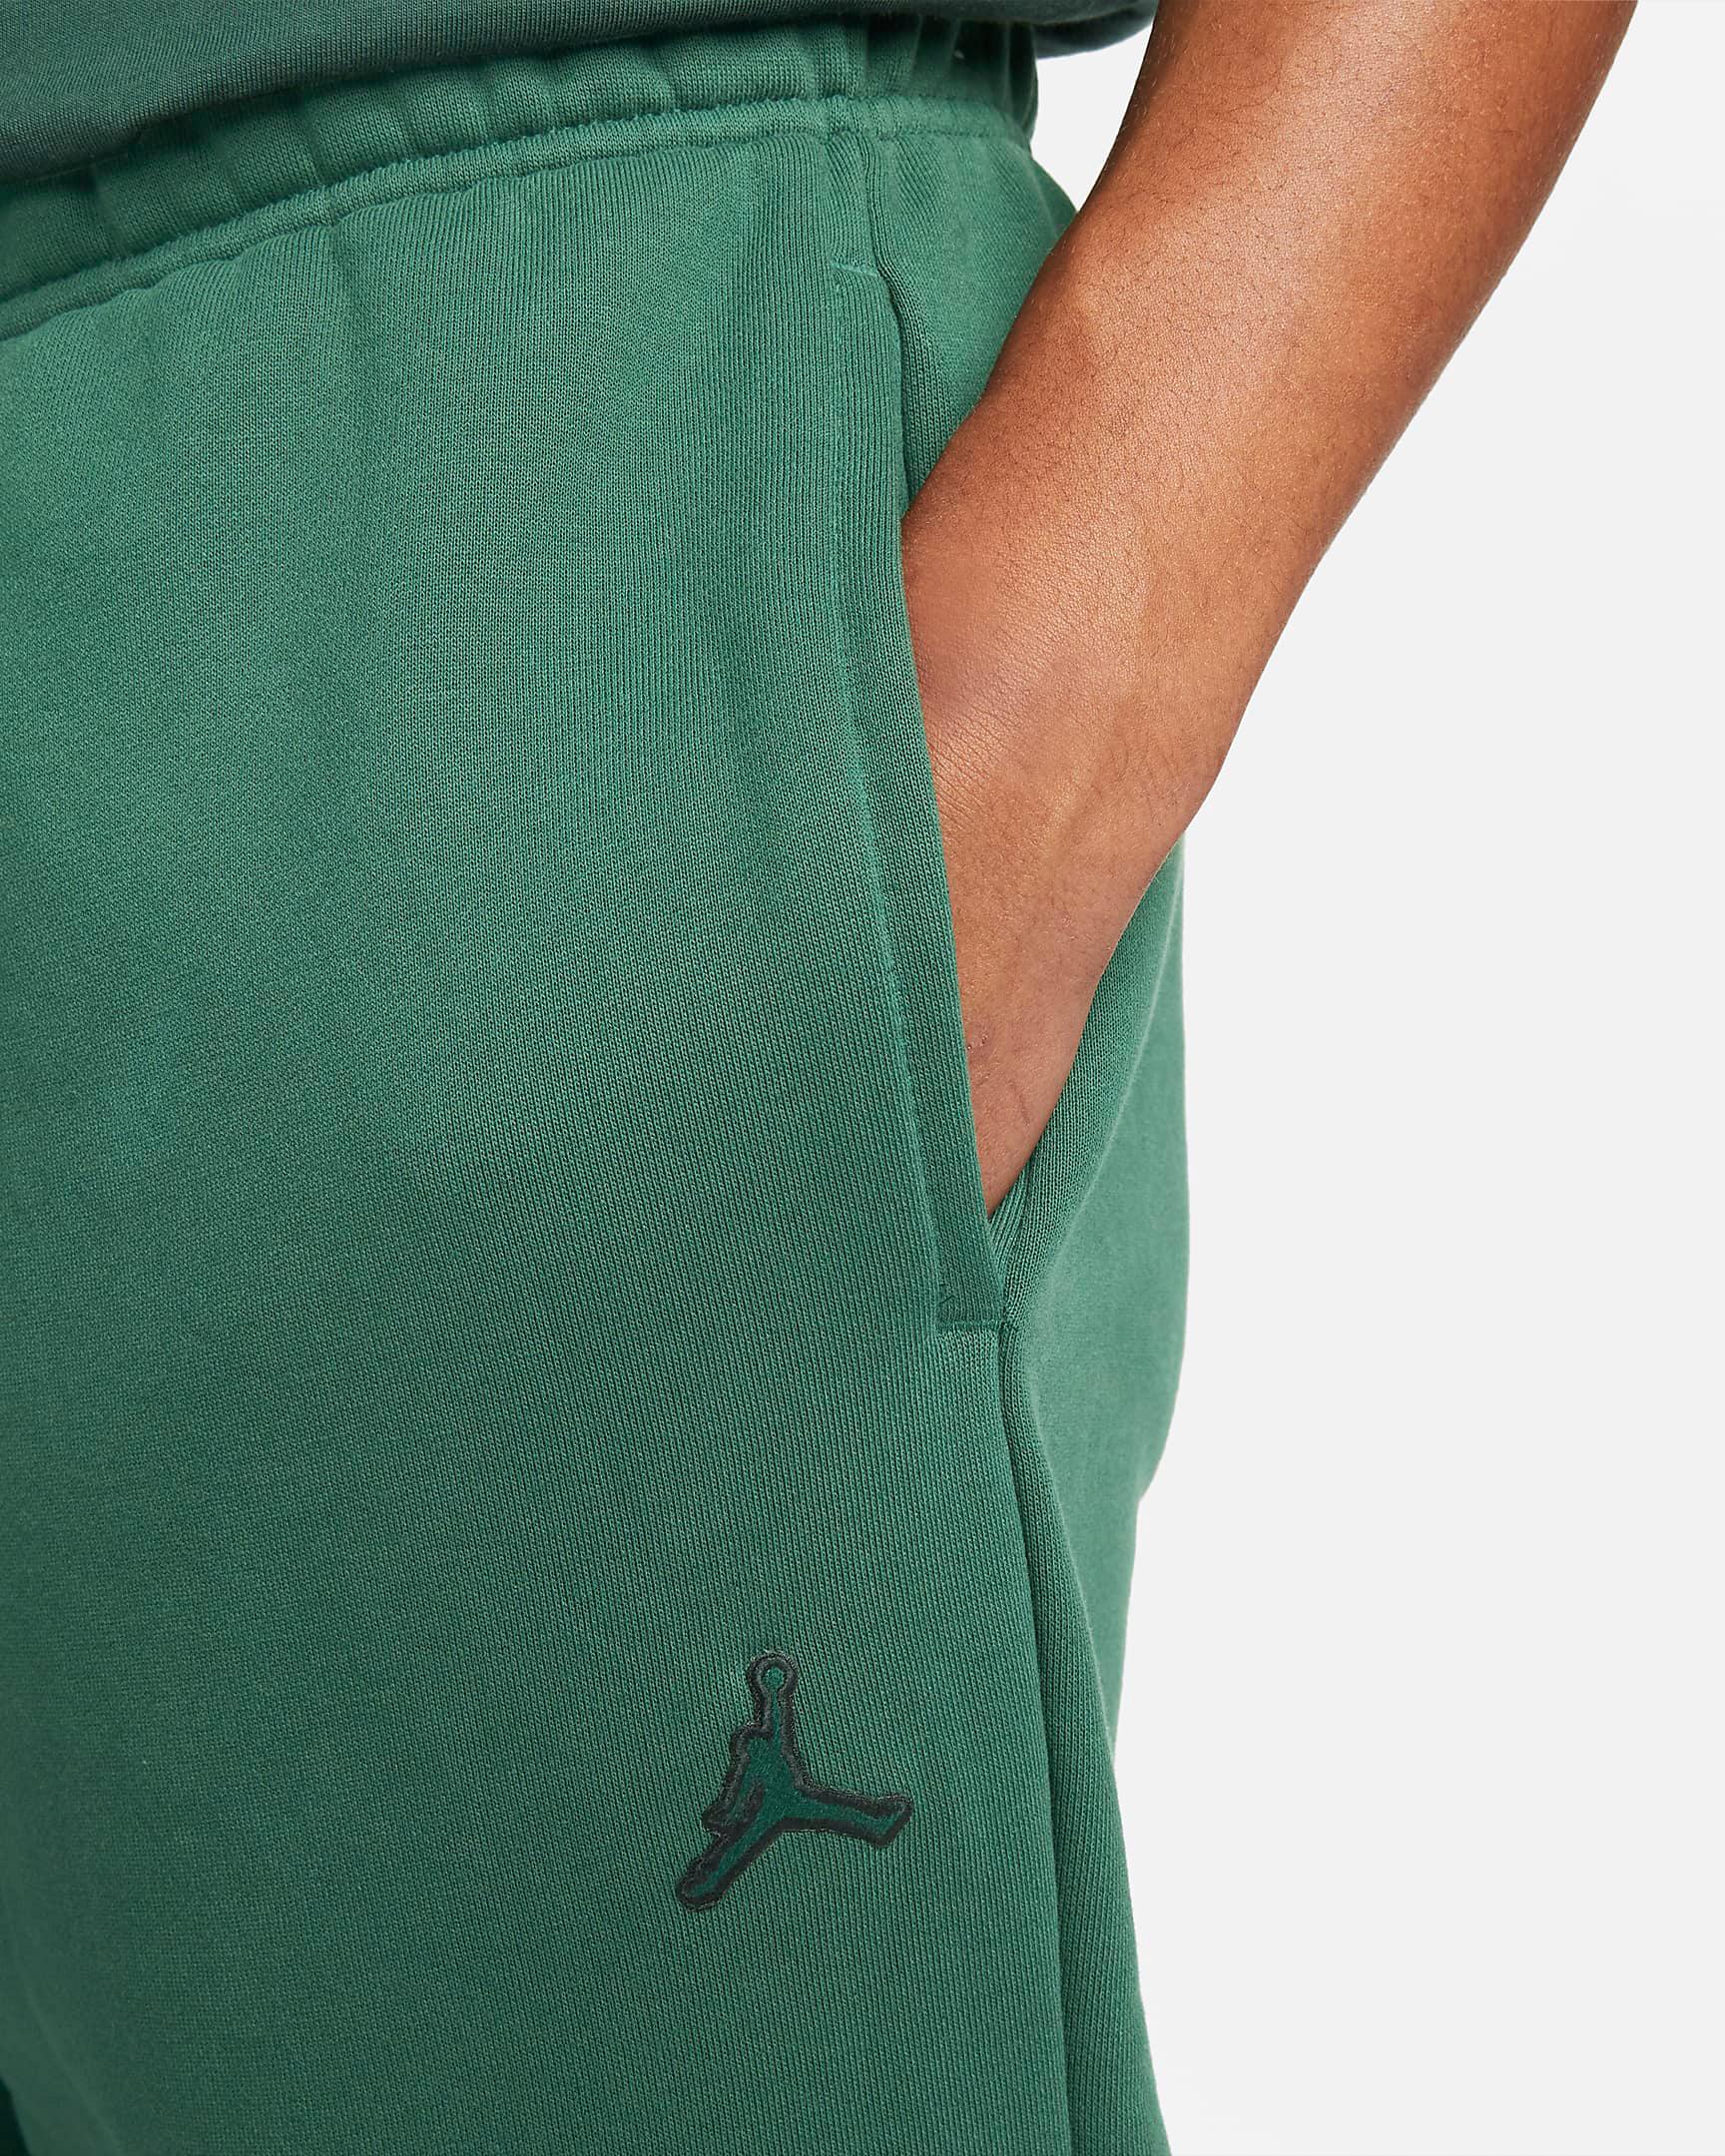 jordan-noble-green-statement-fleece-pants-3